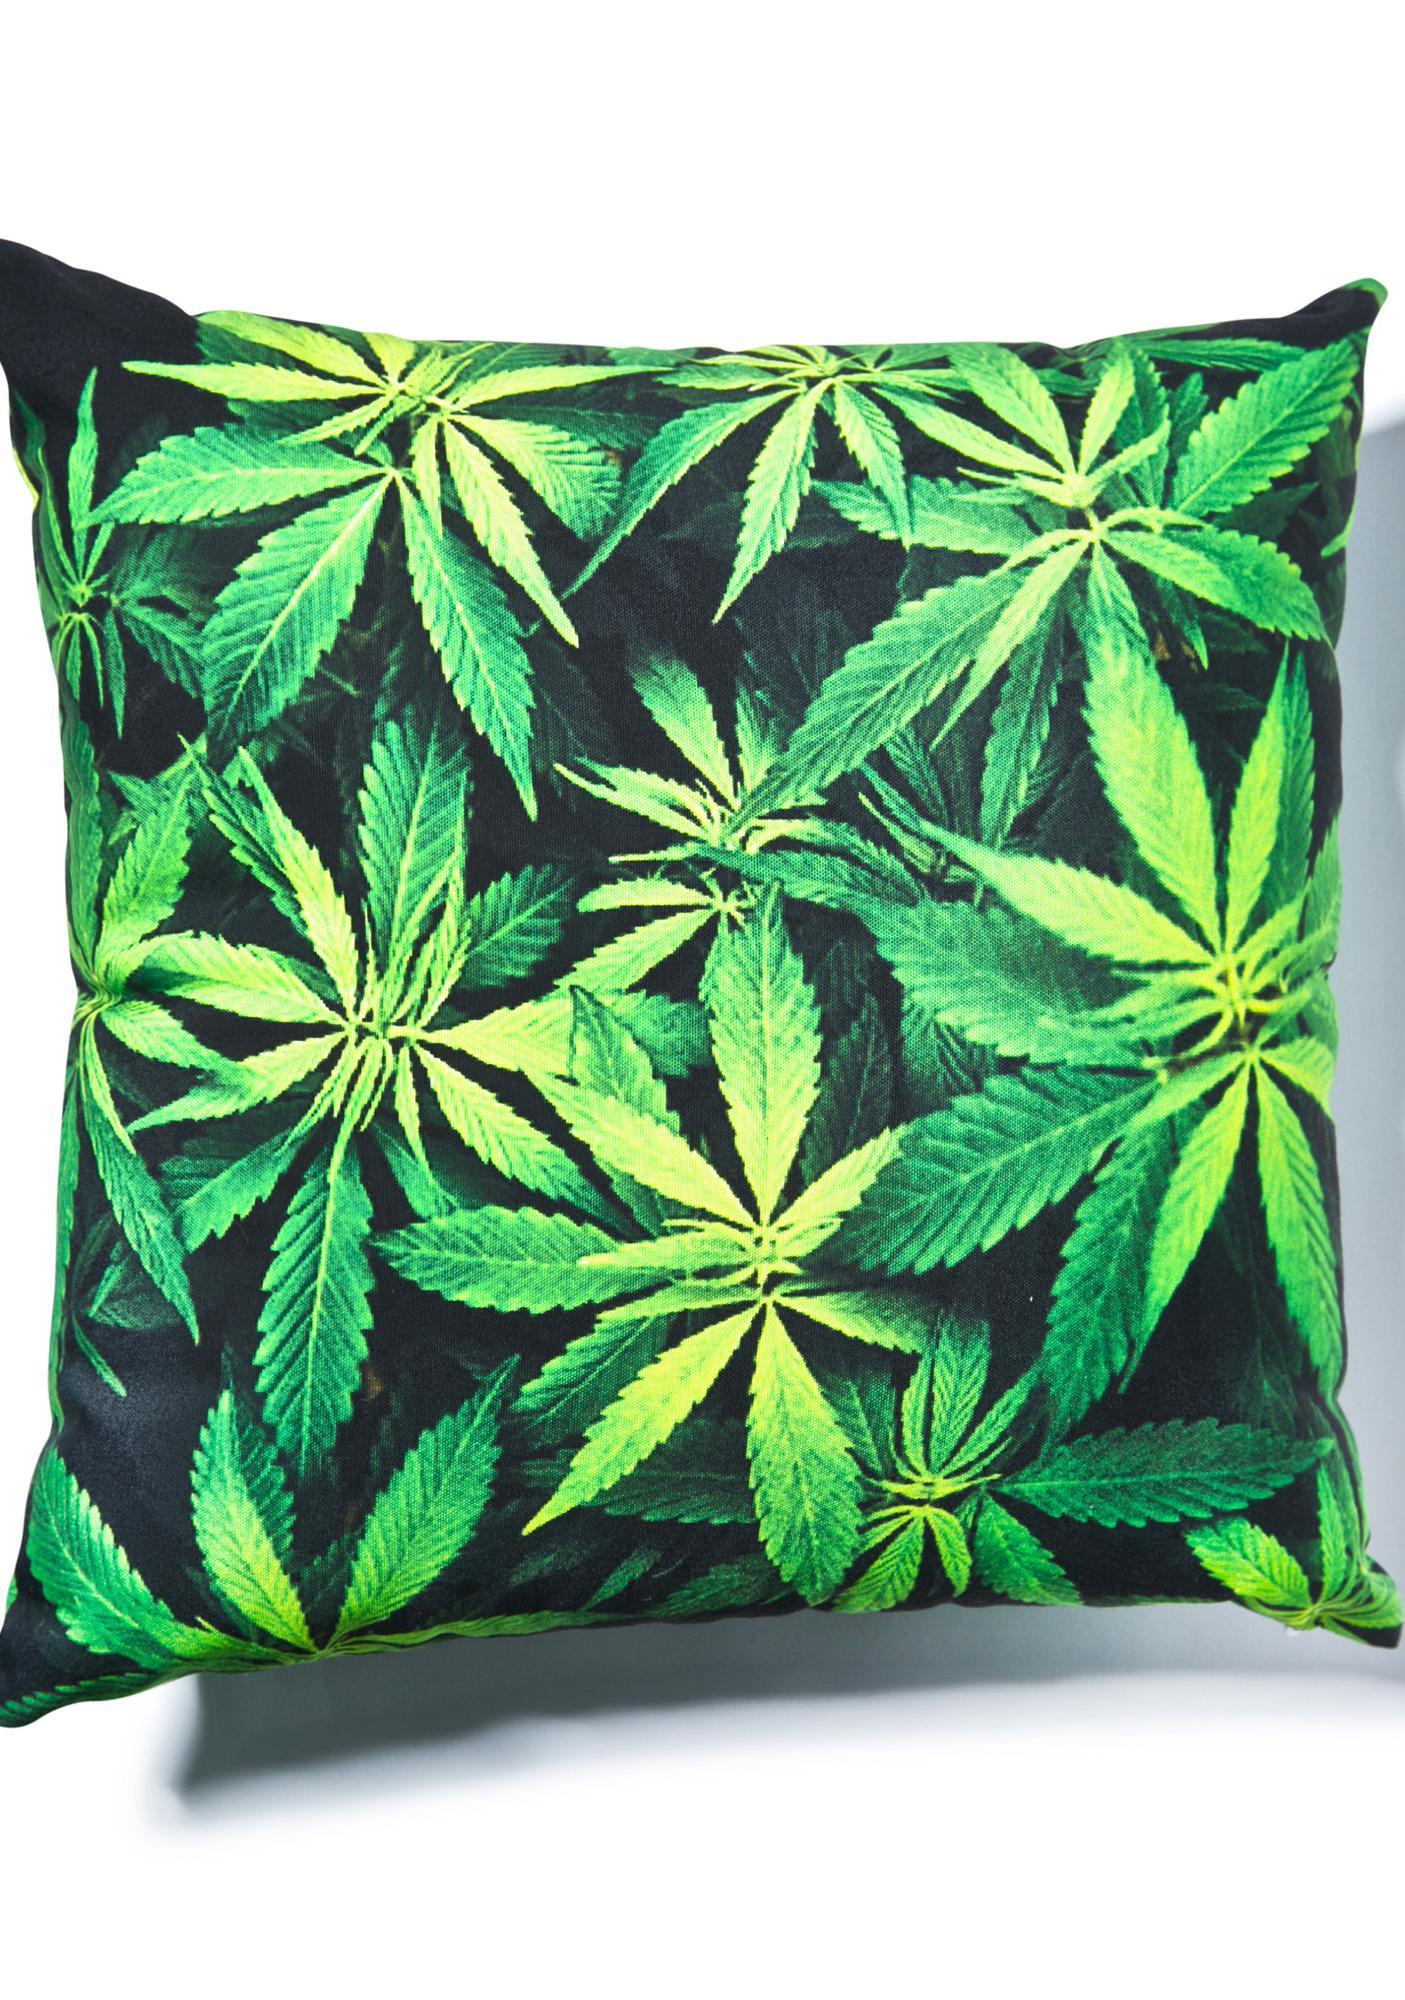 Chronic Pillow